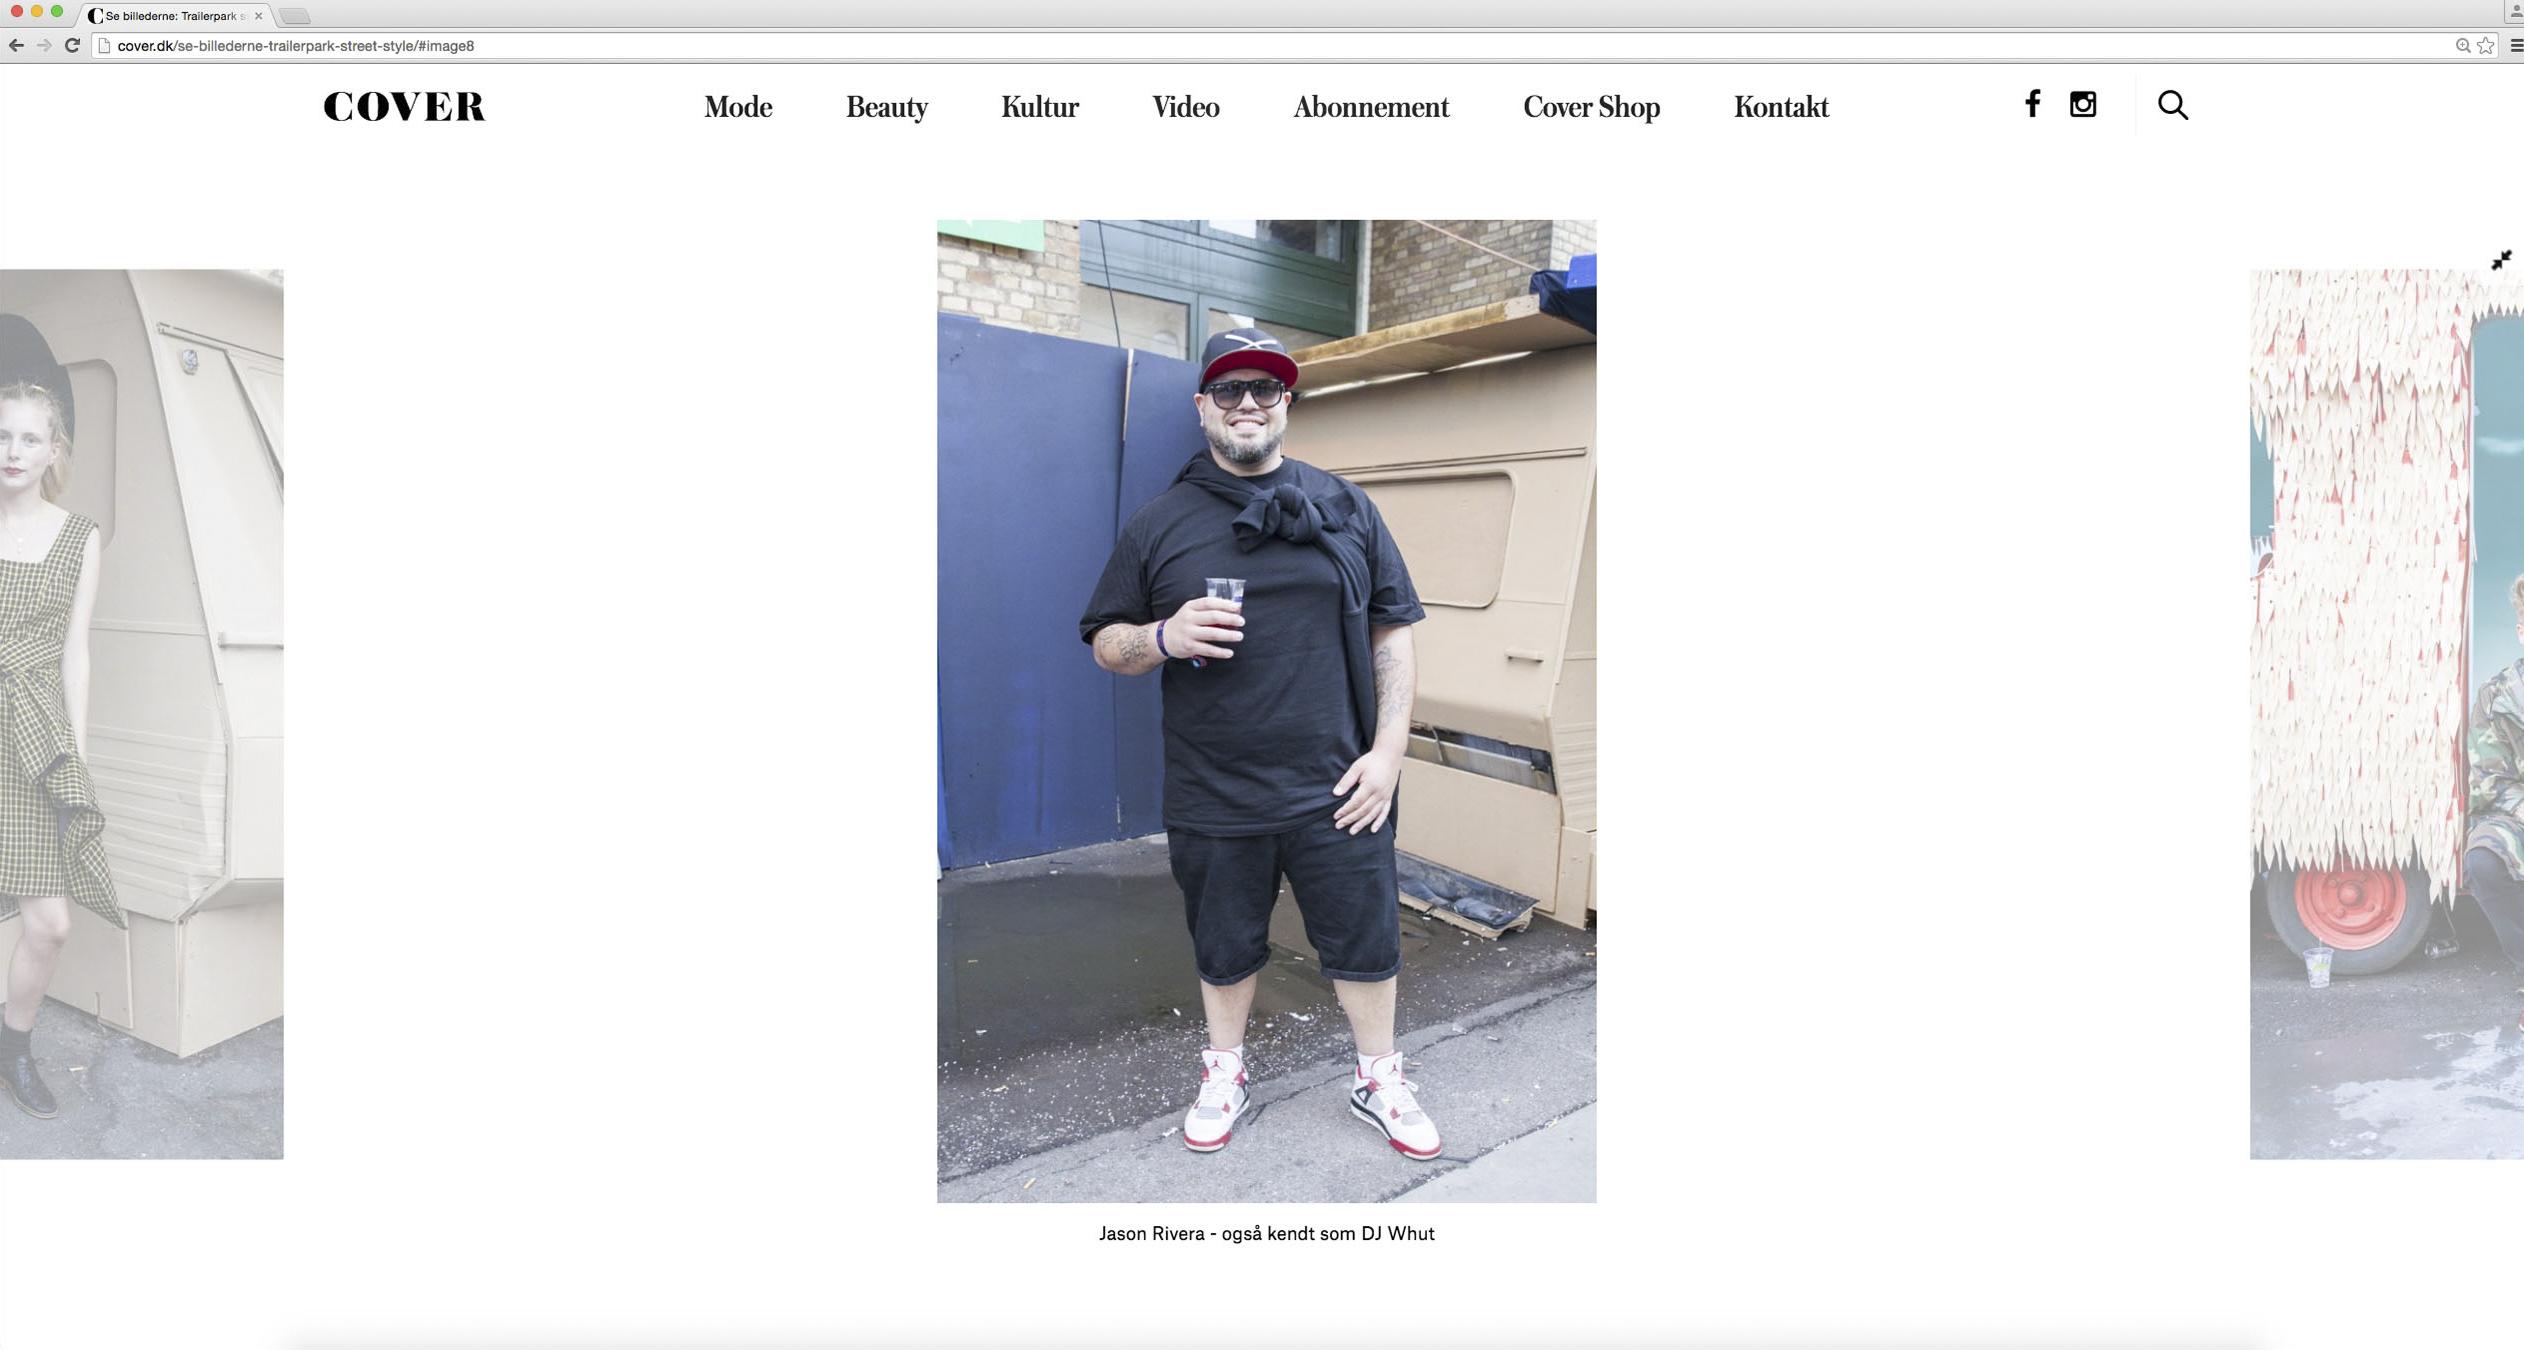 Streetstyle_CoverMagazine_TrailerparkFestival2016_8_1